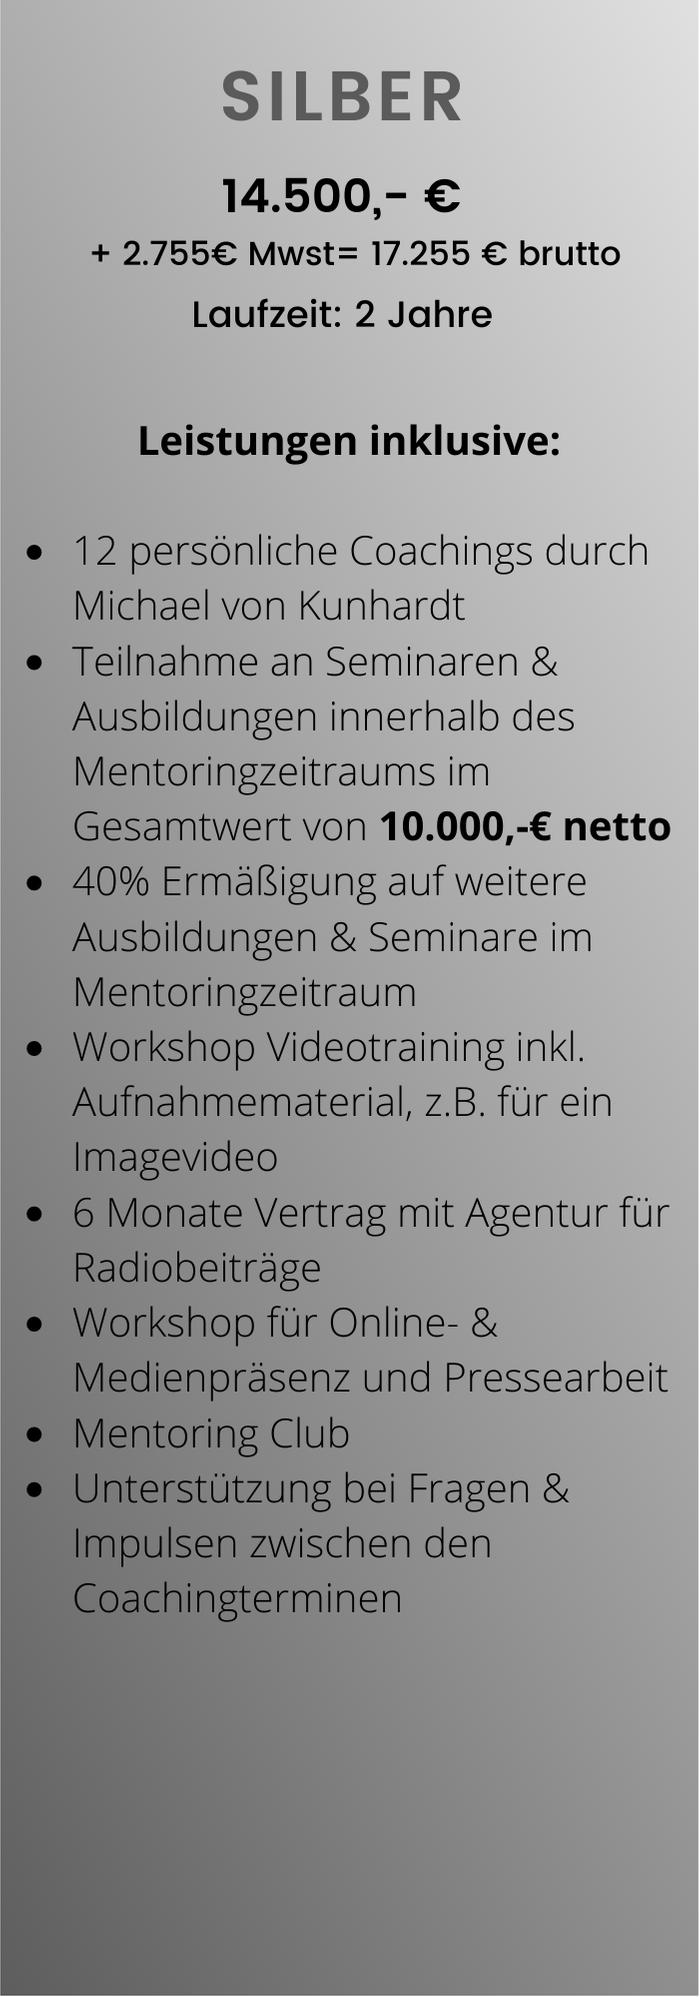 https://www.vonkunhardt.de/wp-content/uploads/2021/02/Silber-700x1997.png